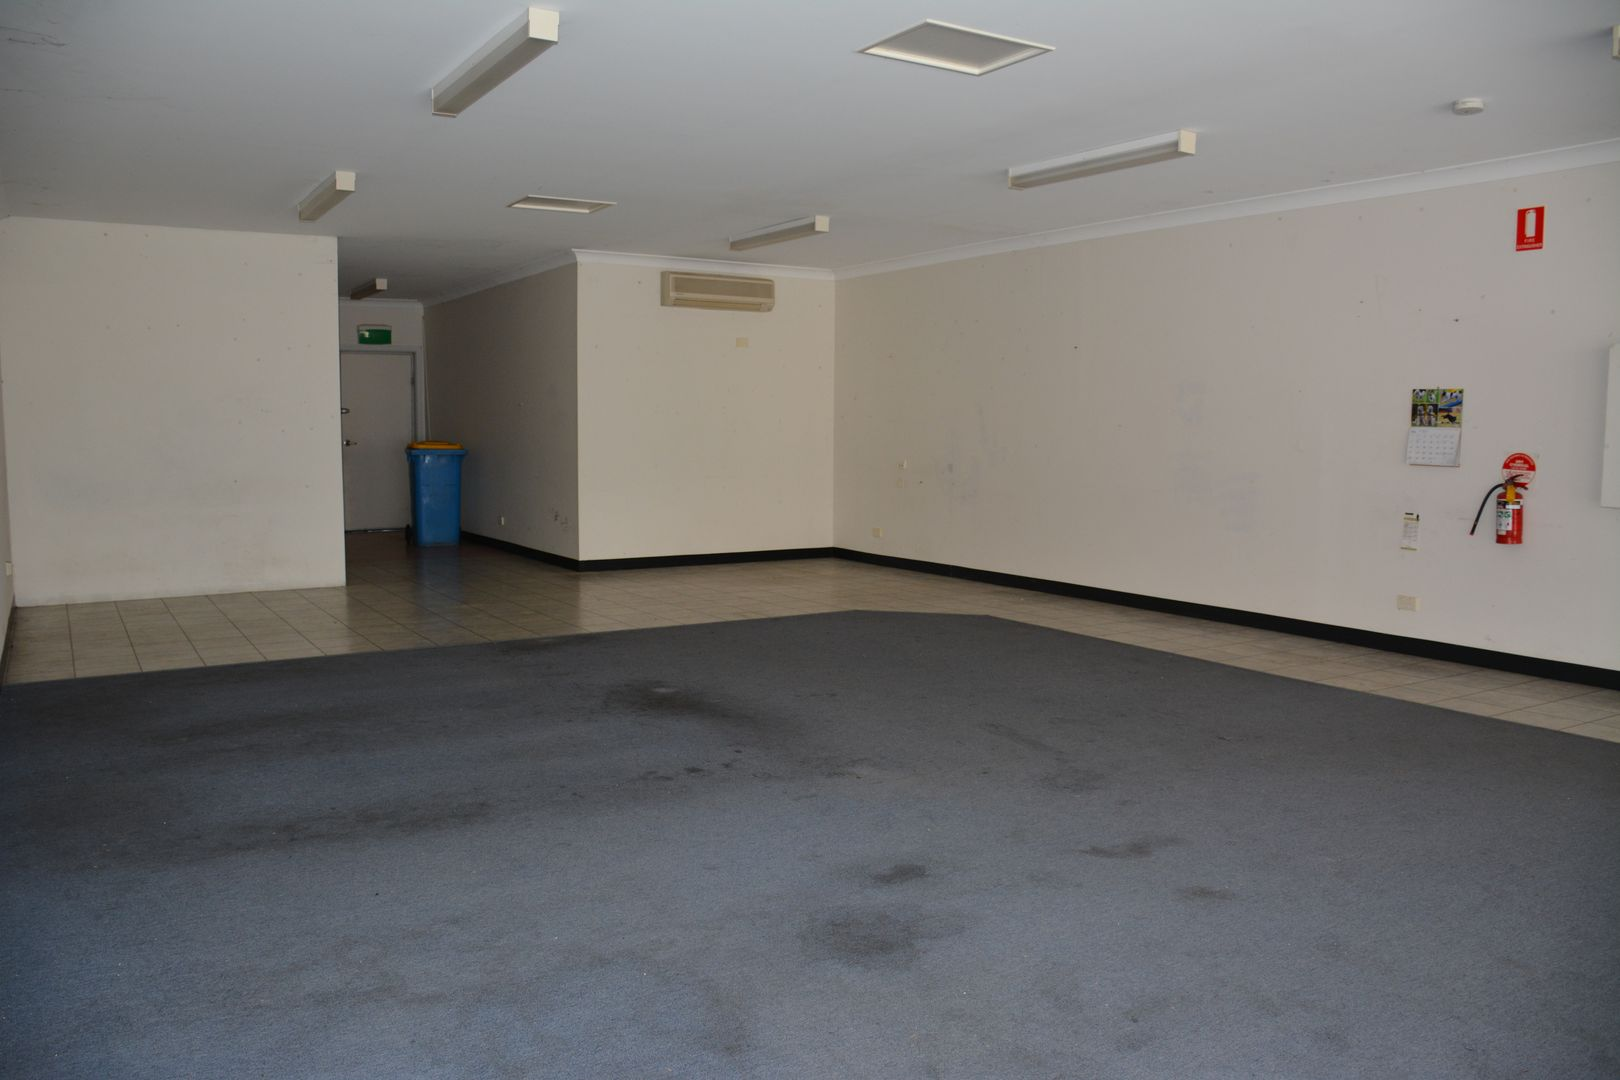 4/106-108 Belmore Street,, Yarrawonga VIC 3730, Image 2